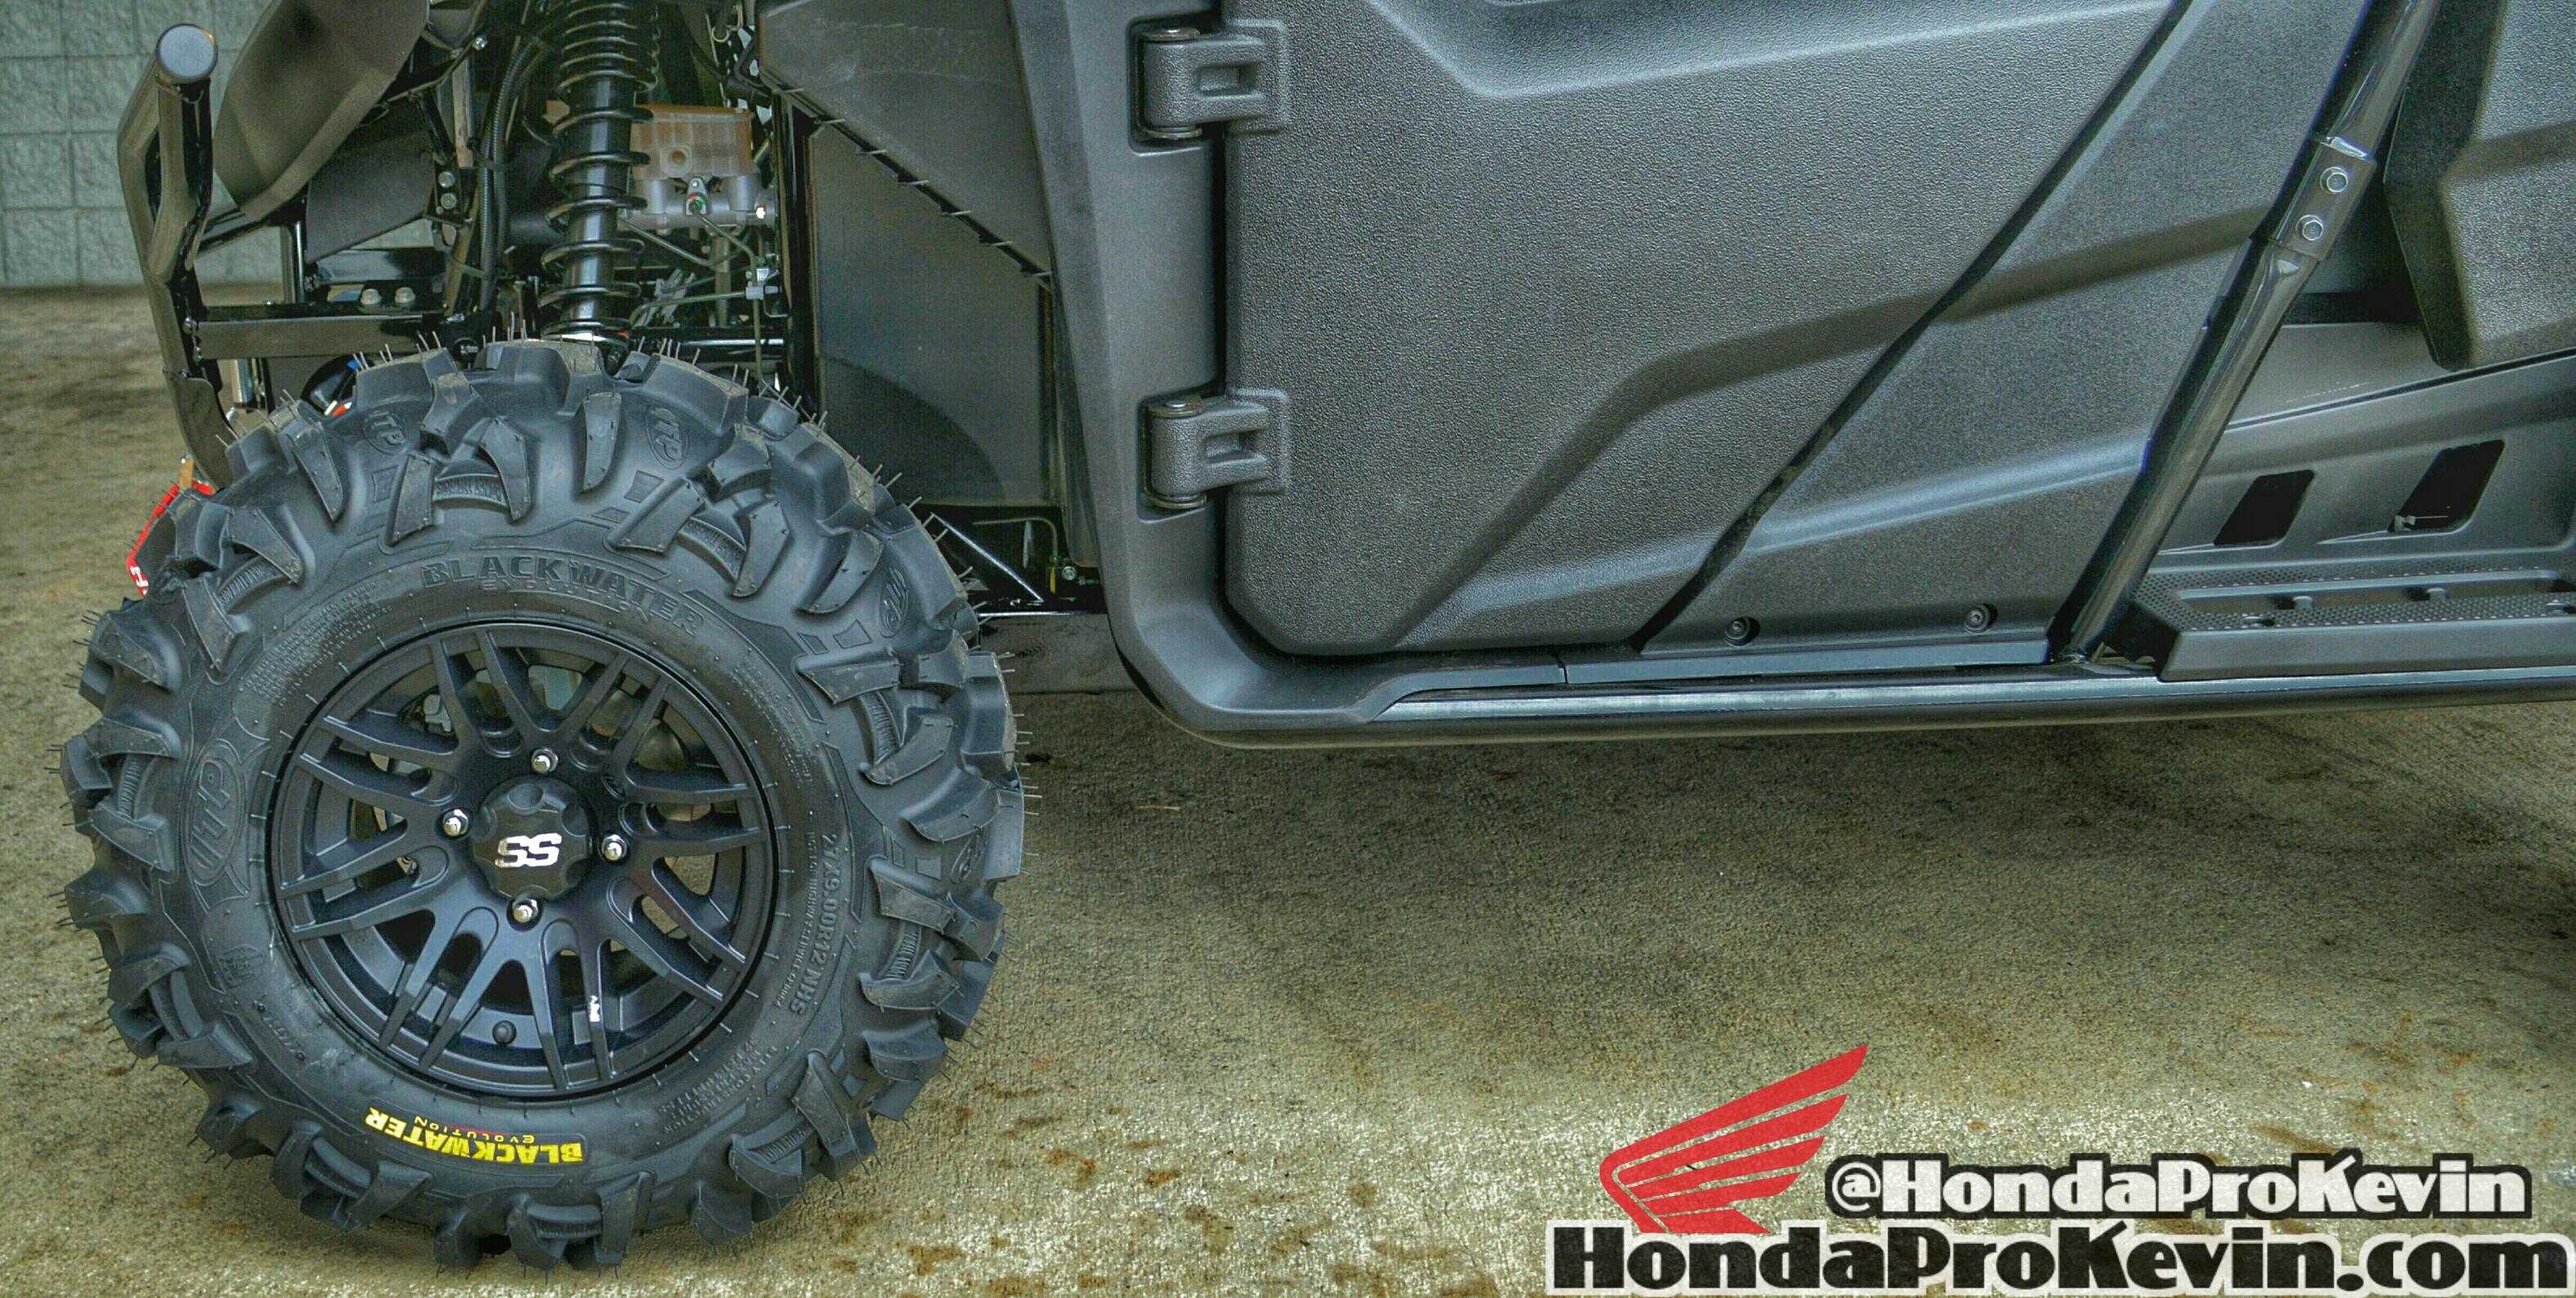 New yamaha sxs autos weblog for 2018 yamaha utv rumors